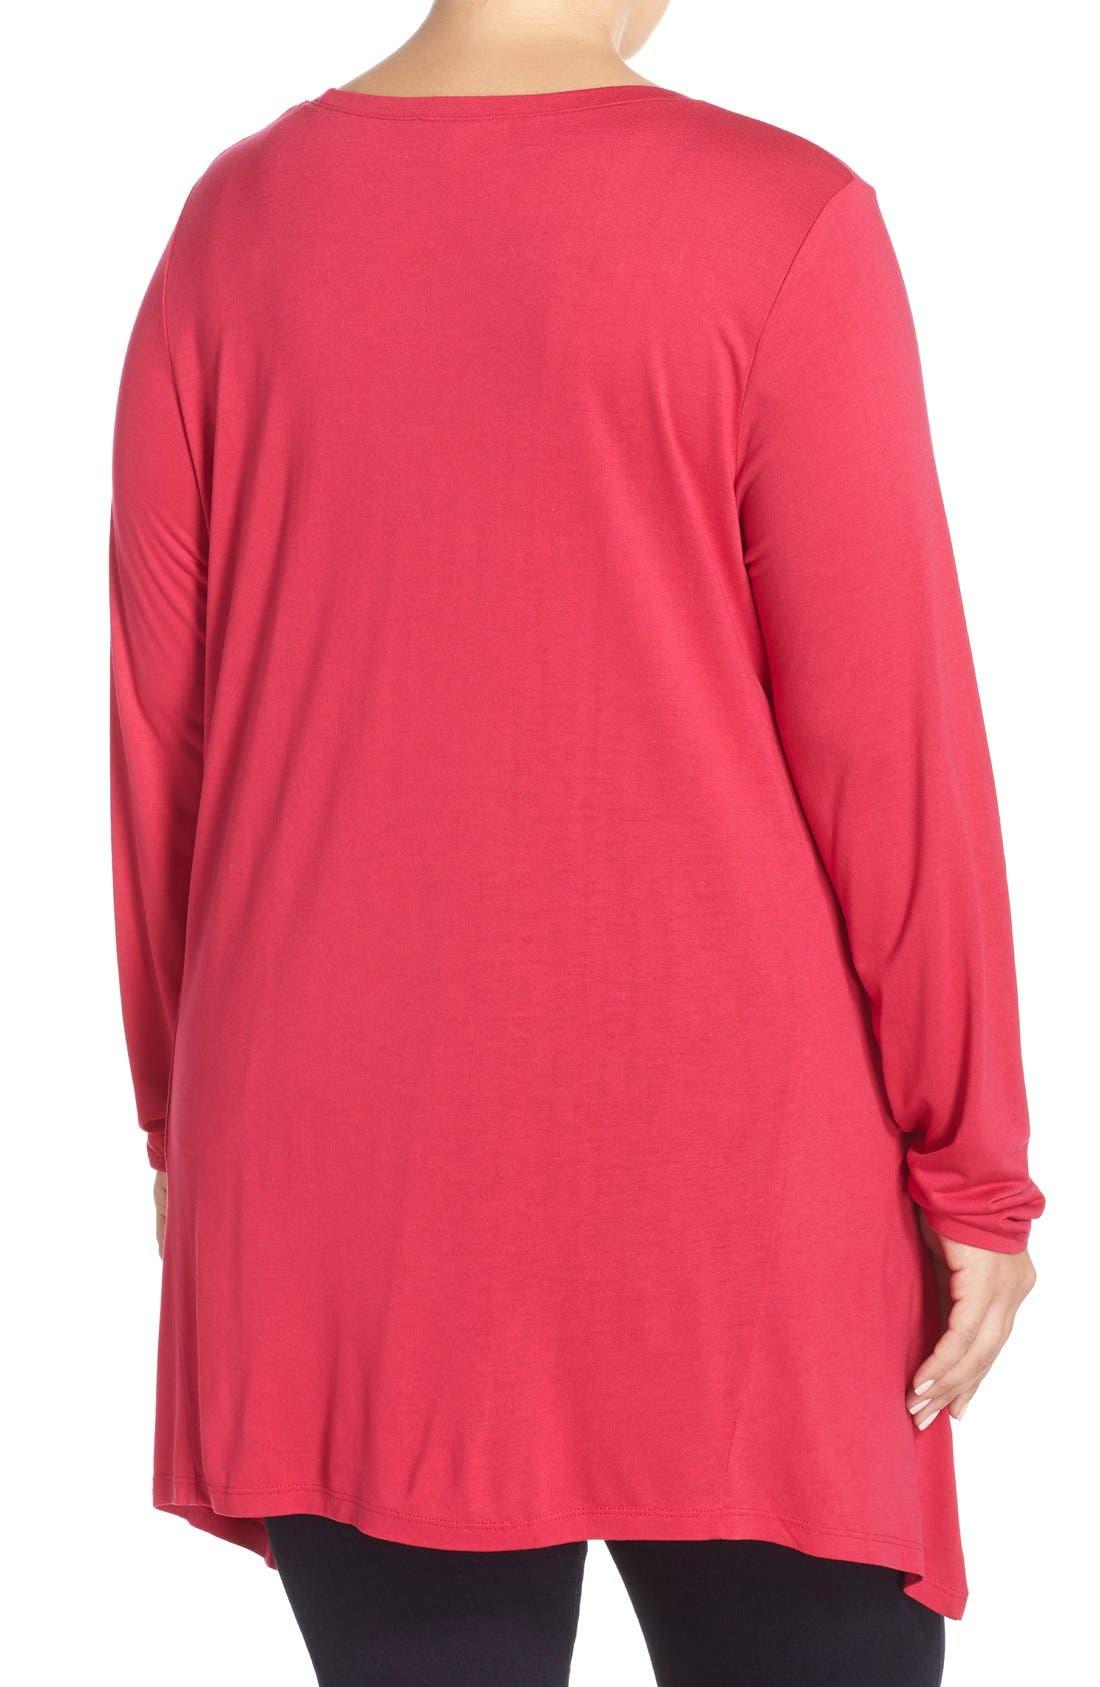 Alternate Image 2  - Sejour Handkerchief Hem Tunic Top (Plus Size)